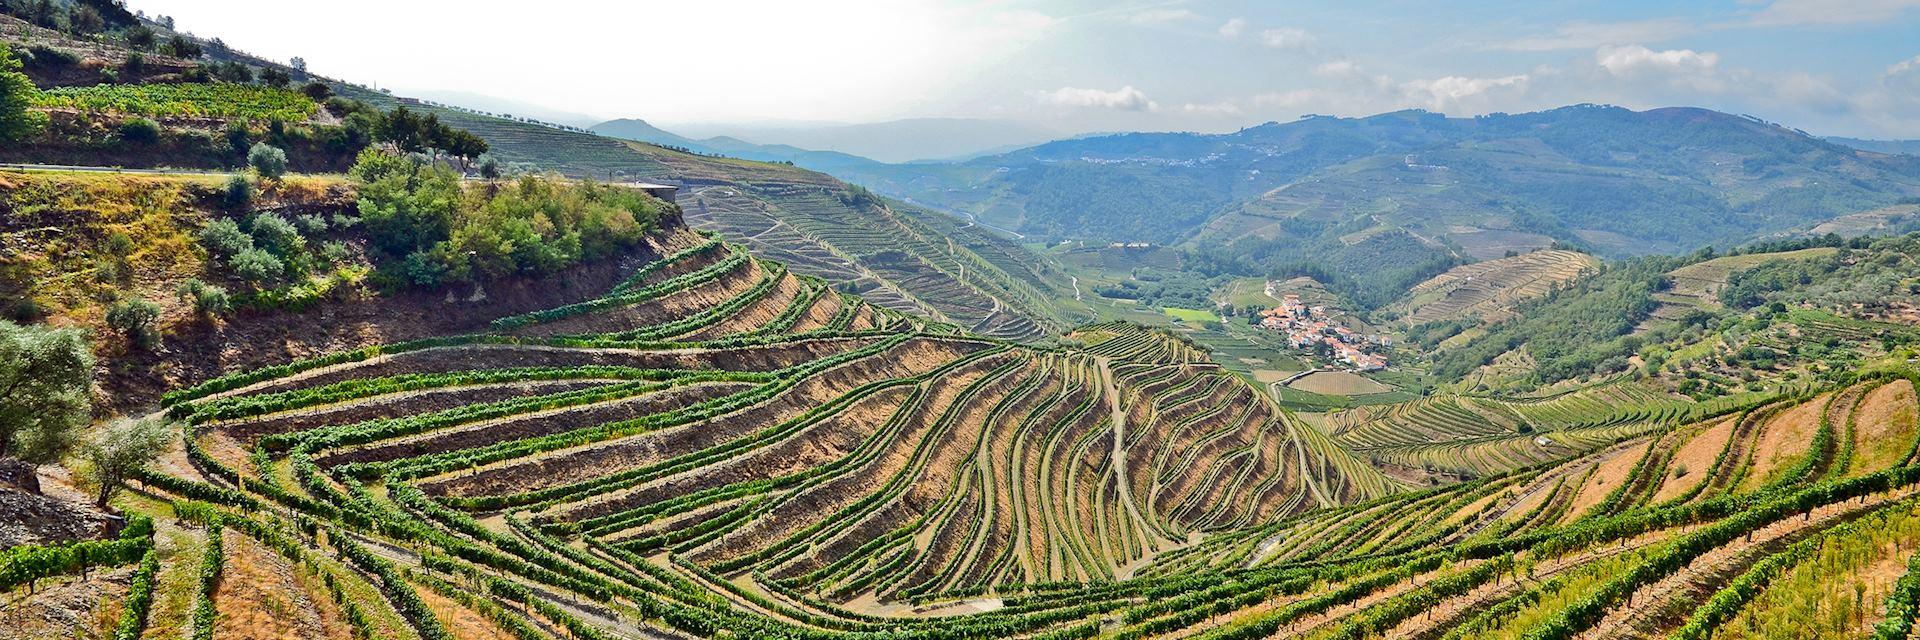 Vineyards near Pinhao, Portugal